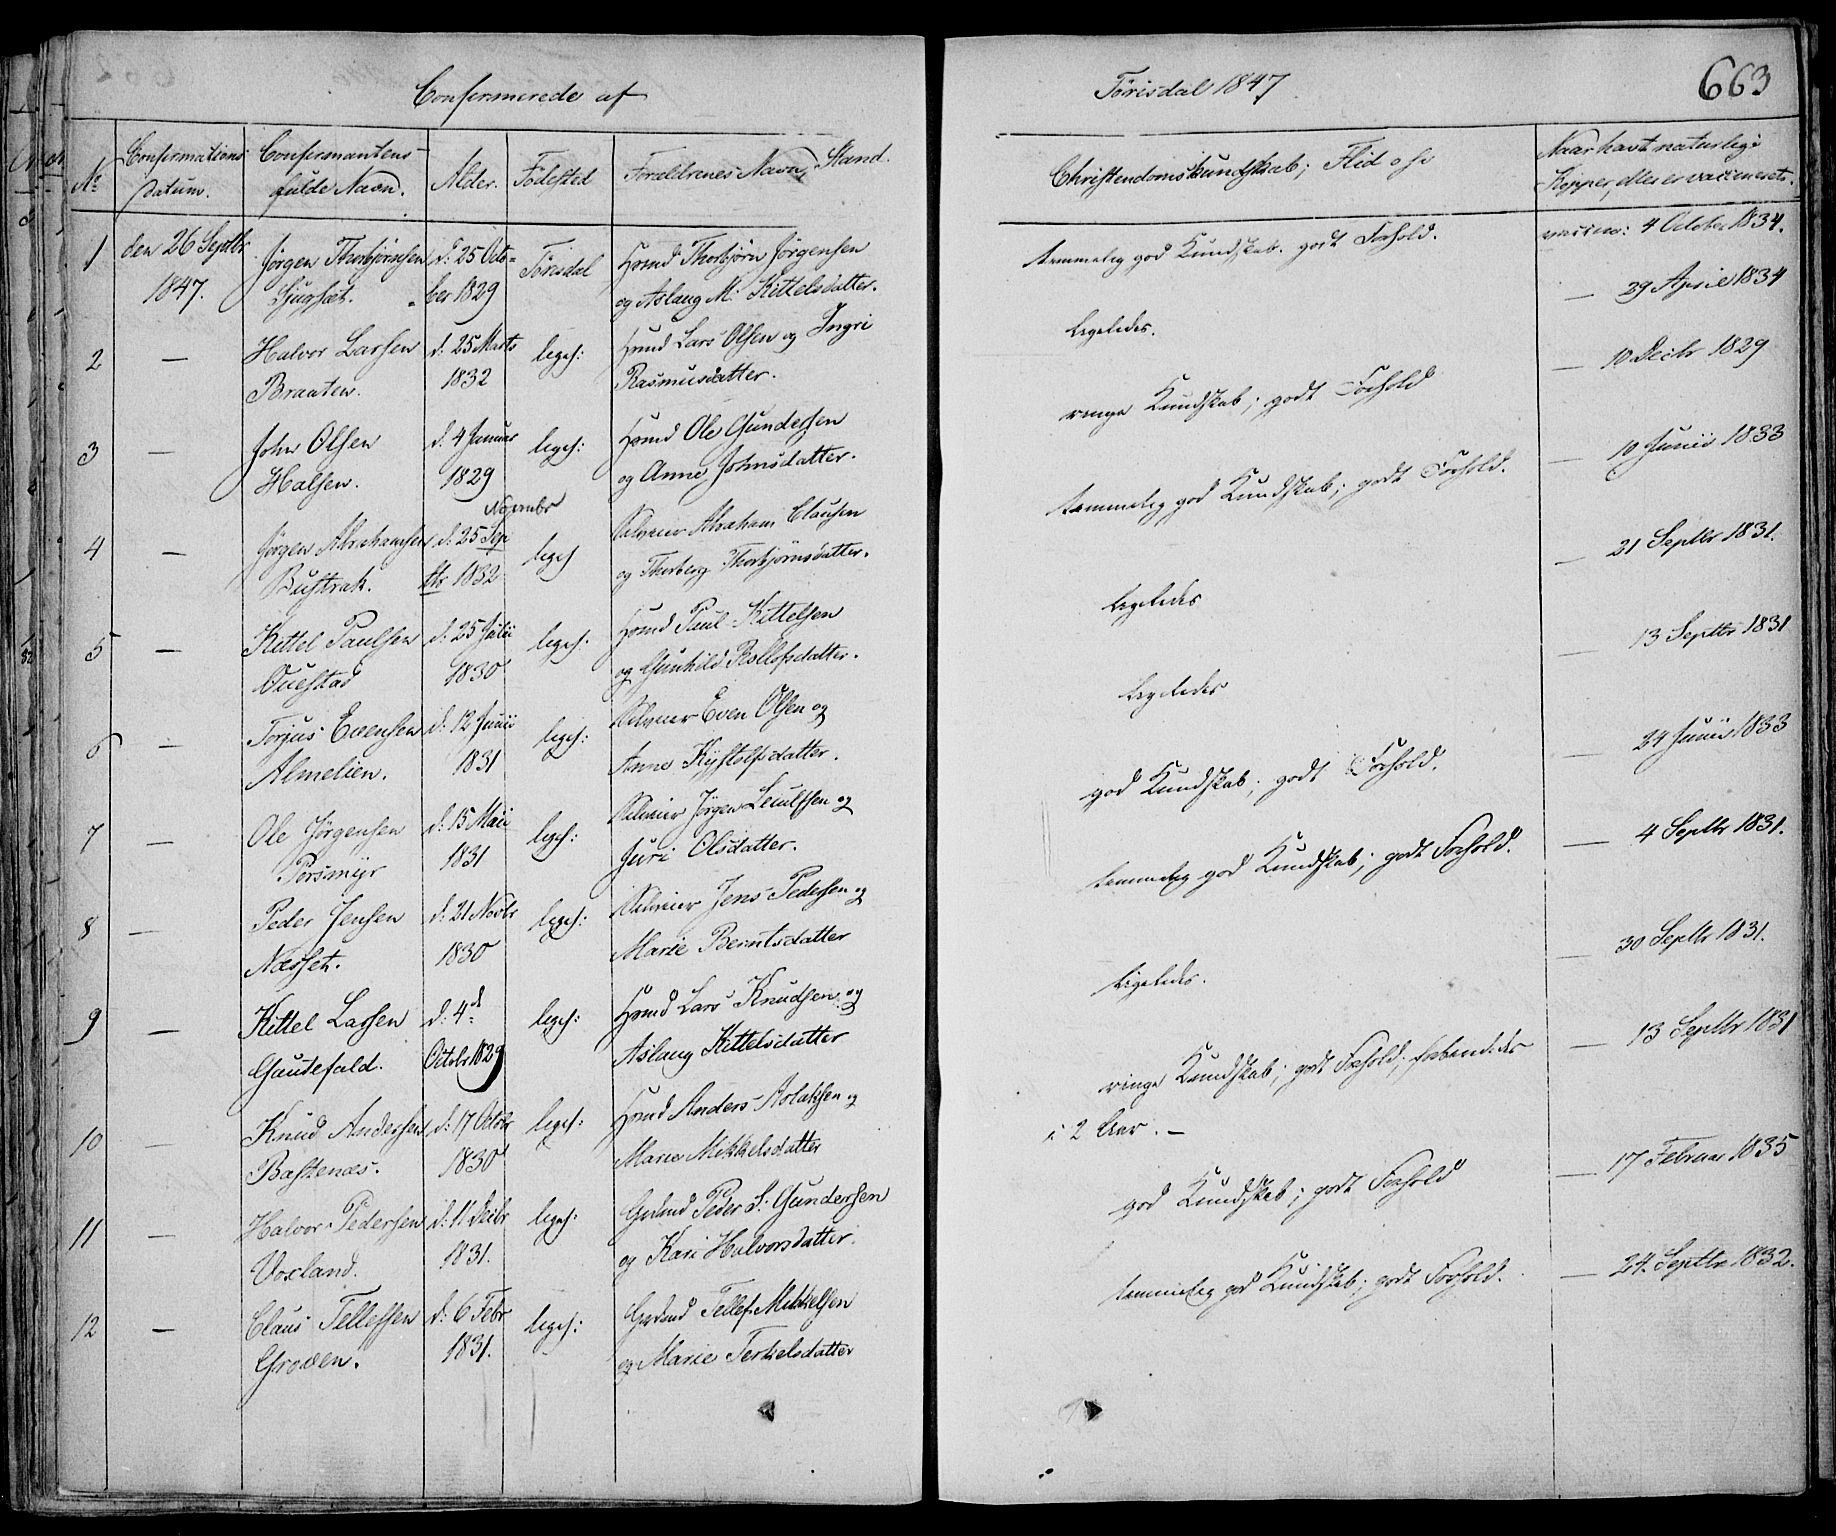 SAKO, Drangedal kirkebøker, F/Fa/L0007b: Ministerialbok nr. 7b, 1837-1856, s. 663